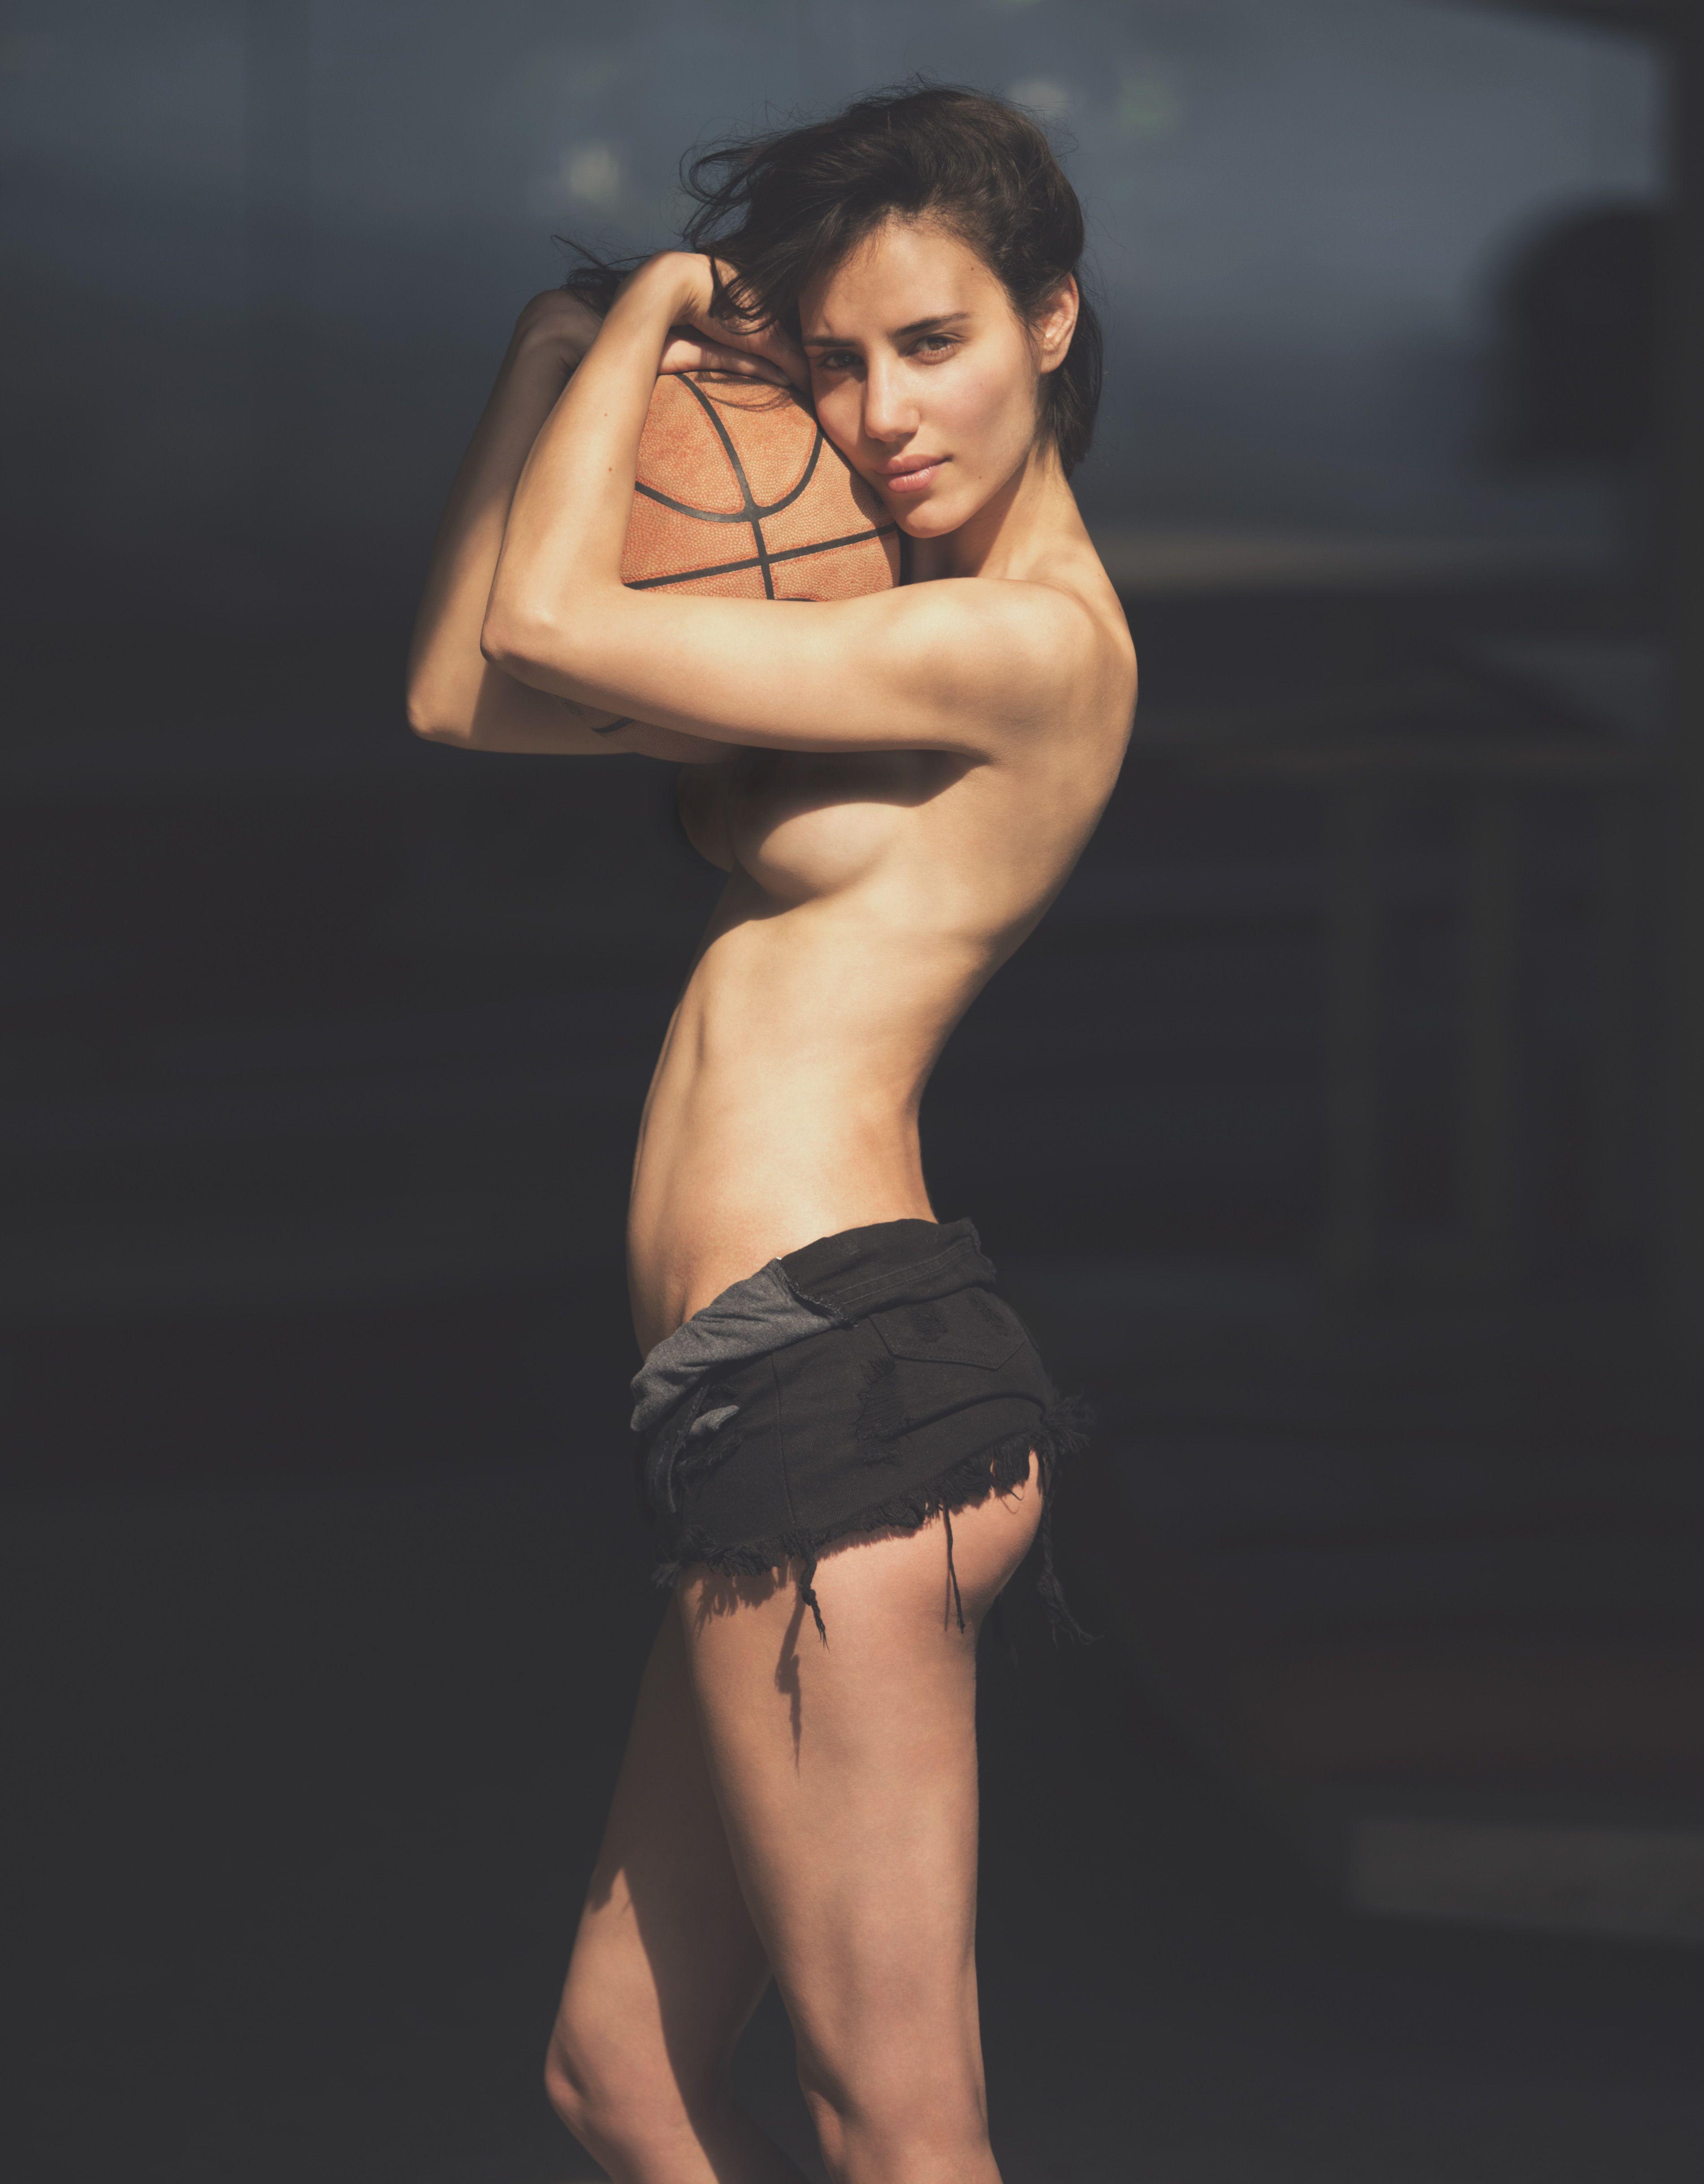 Elisa Meliani by David Bellemere For Playboy USA #elisameliani #davidbellemere #playboy #inspiration